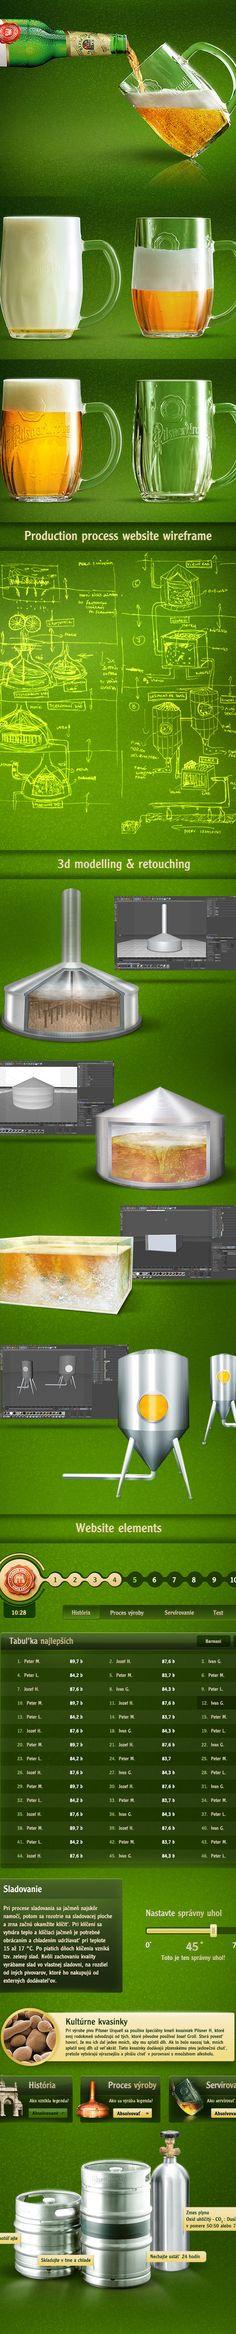 Pilsner Urquell Master Bartender 2012 by Viktor Karvai, via Behance Best Pubs, Pub Food, Food Combining, Beer Recipes, Bartender, My Works, Craft Beer, Drinking, Behance